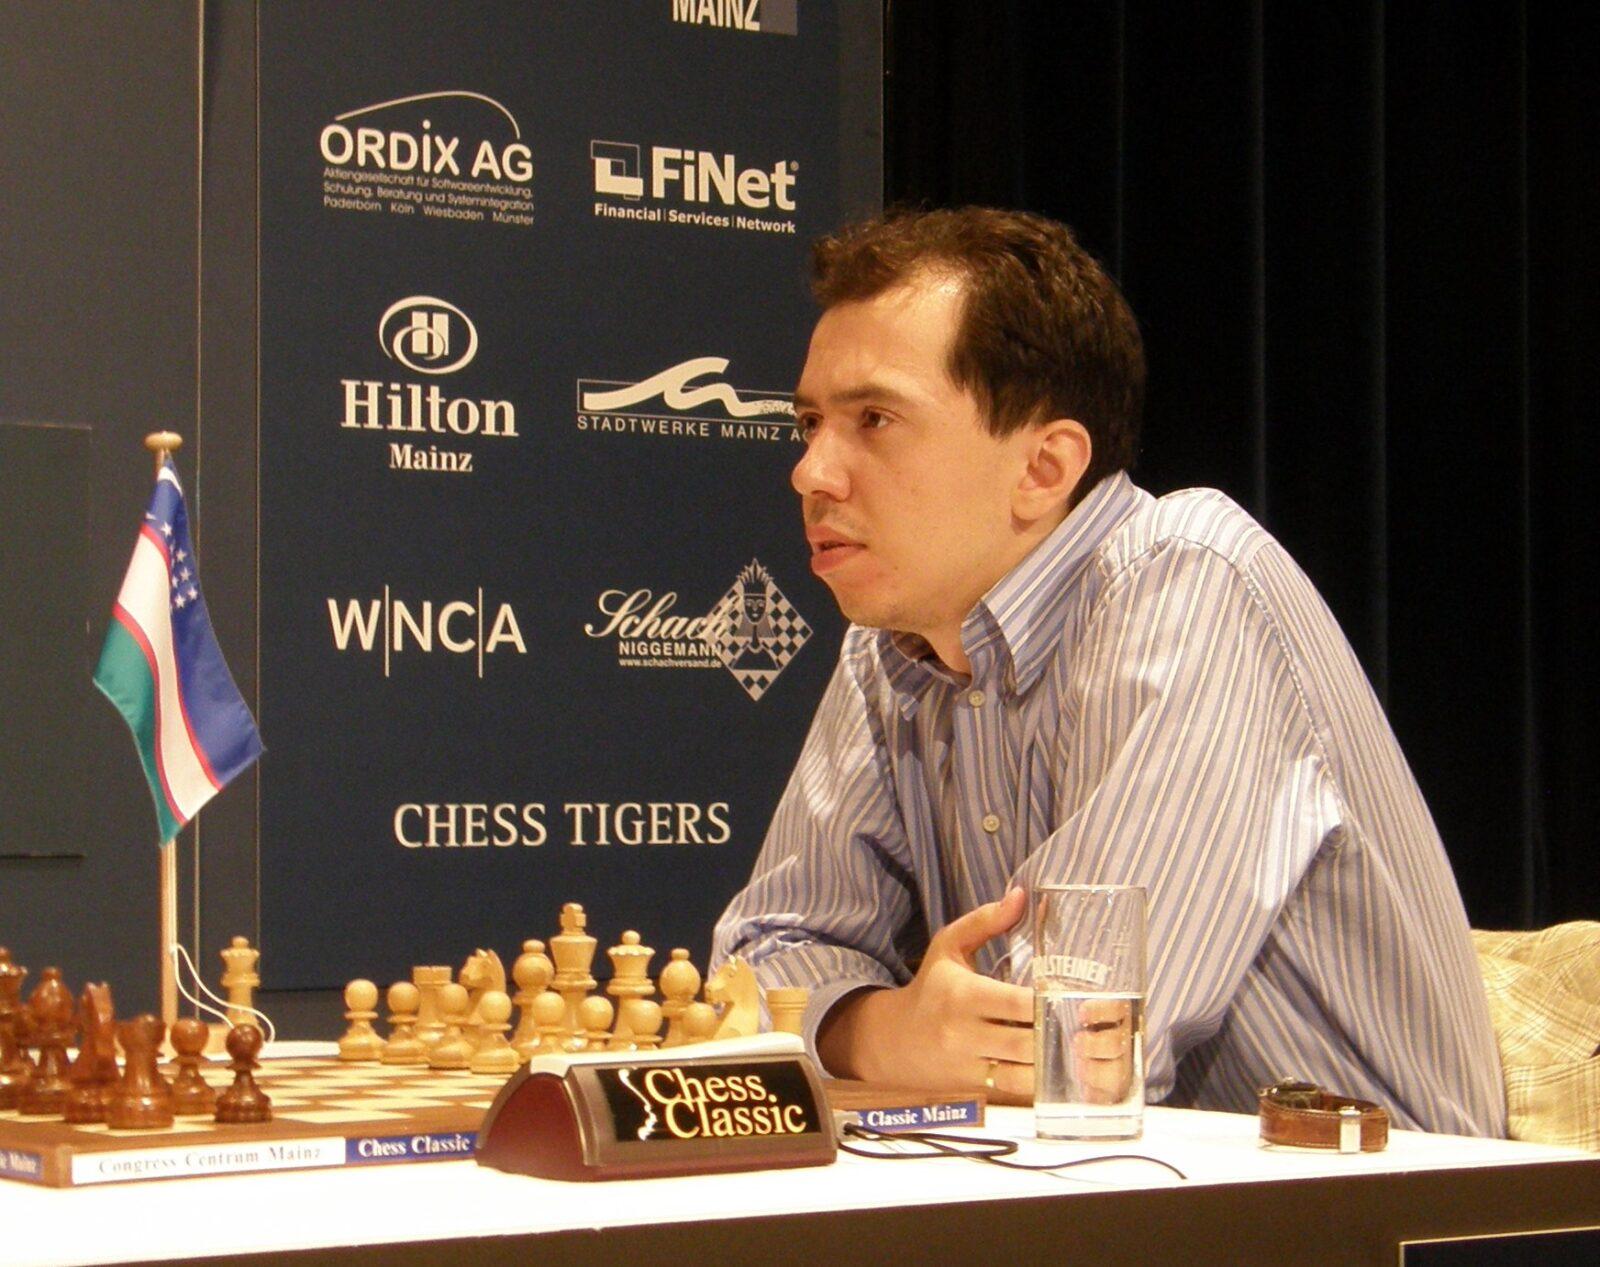 Рустам Касымджанов победил российского шахматиста Владимира Крамника